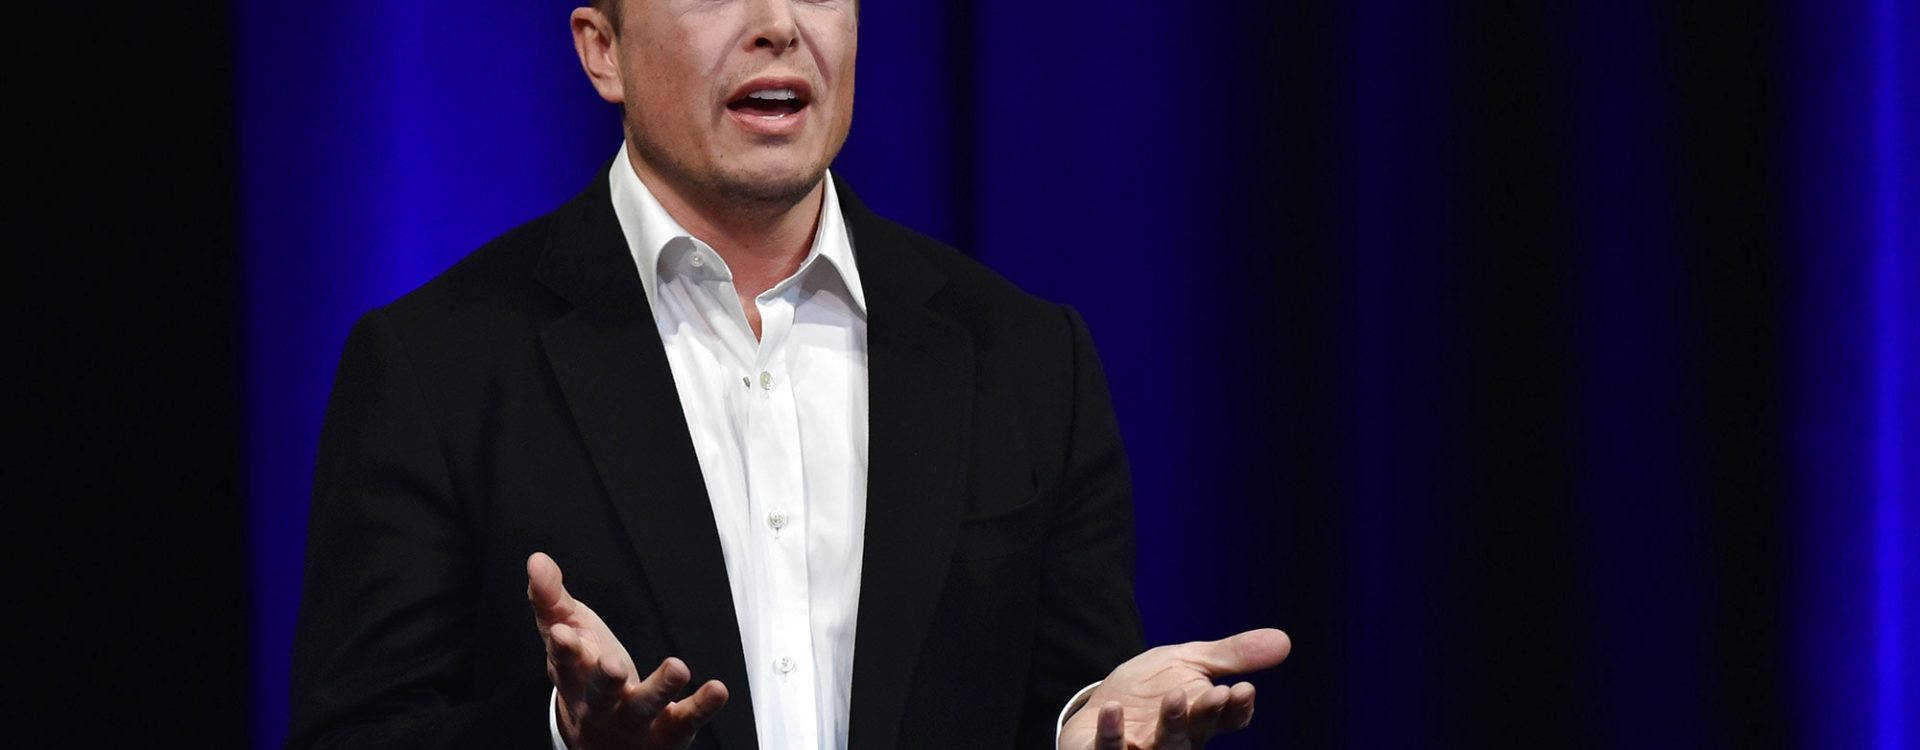 Elon Musk interrupts NASA call during discussion of his coronavirus views